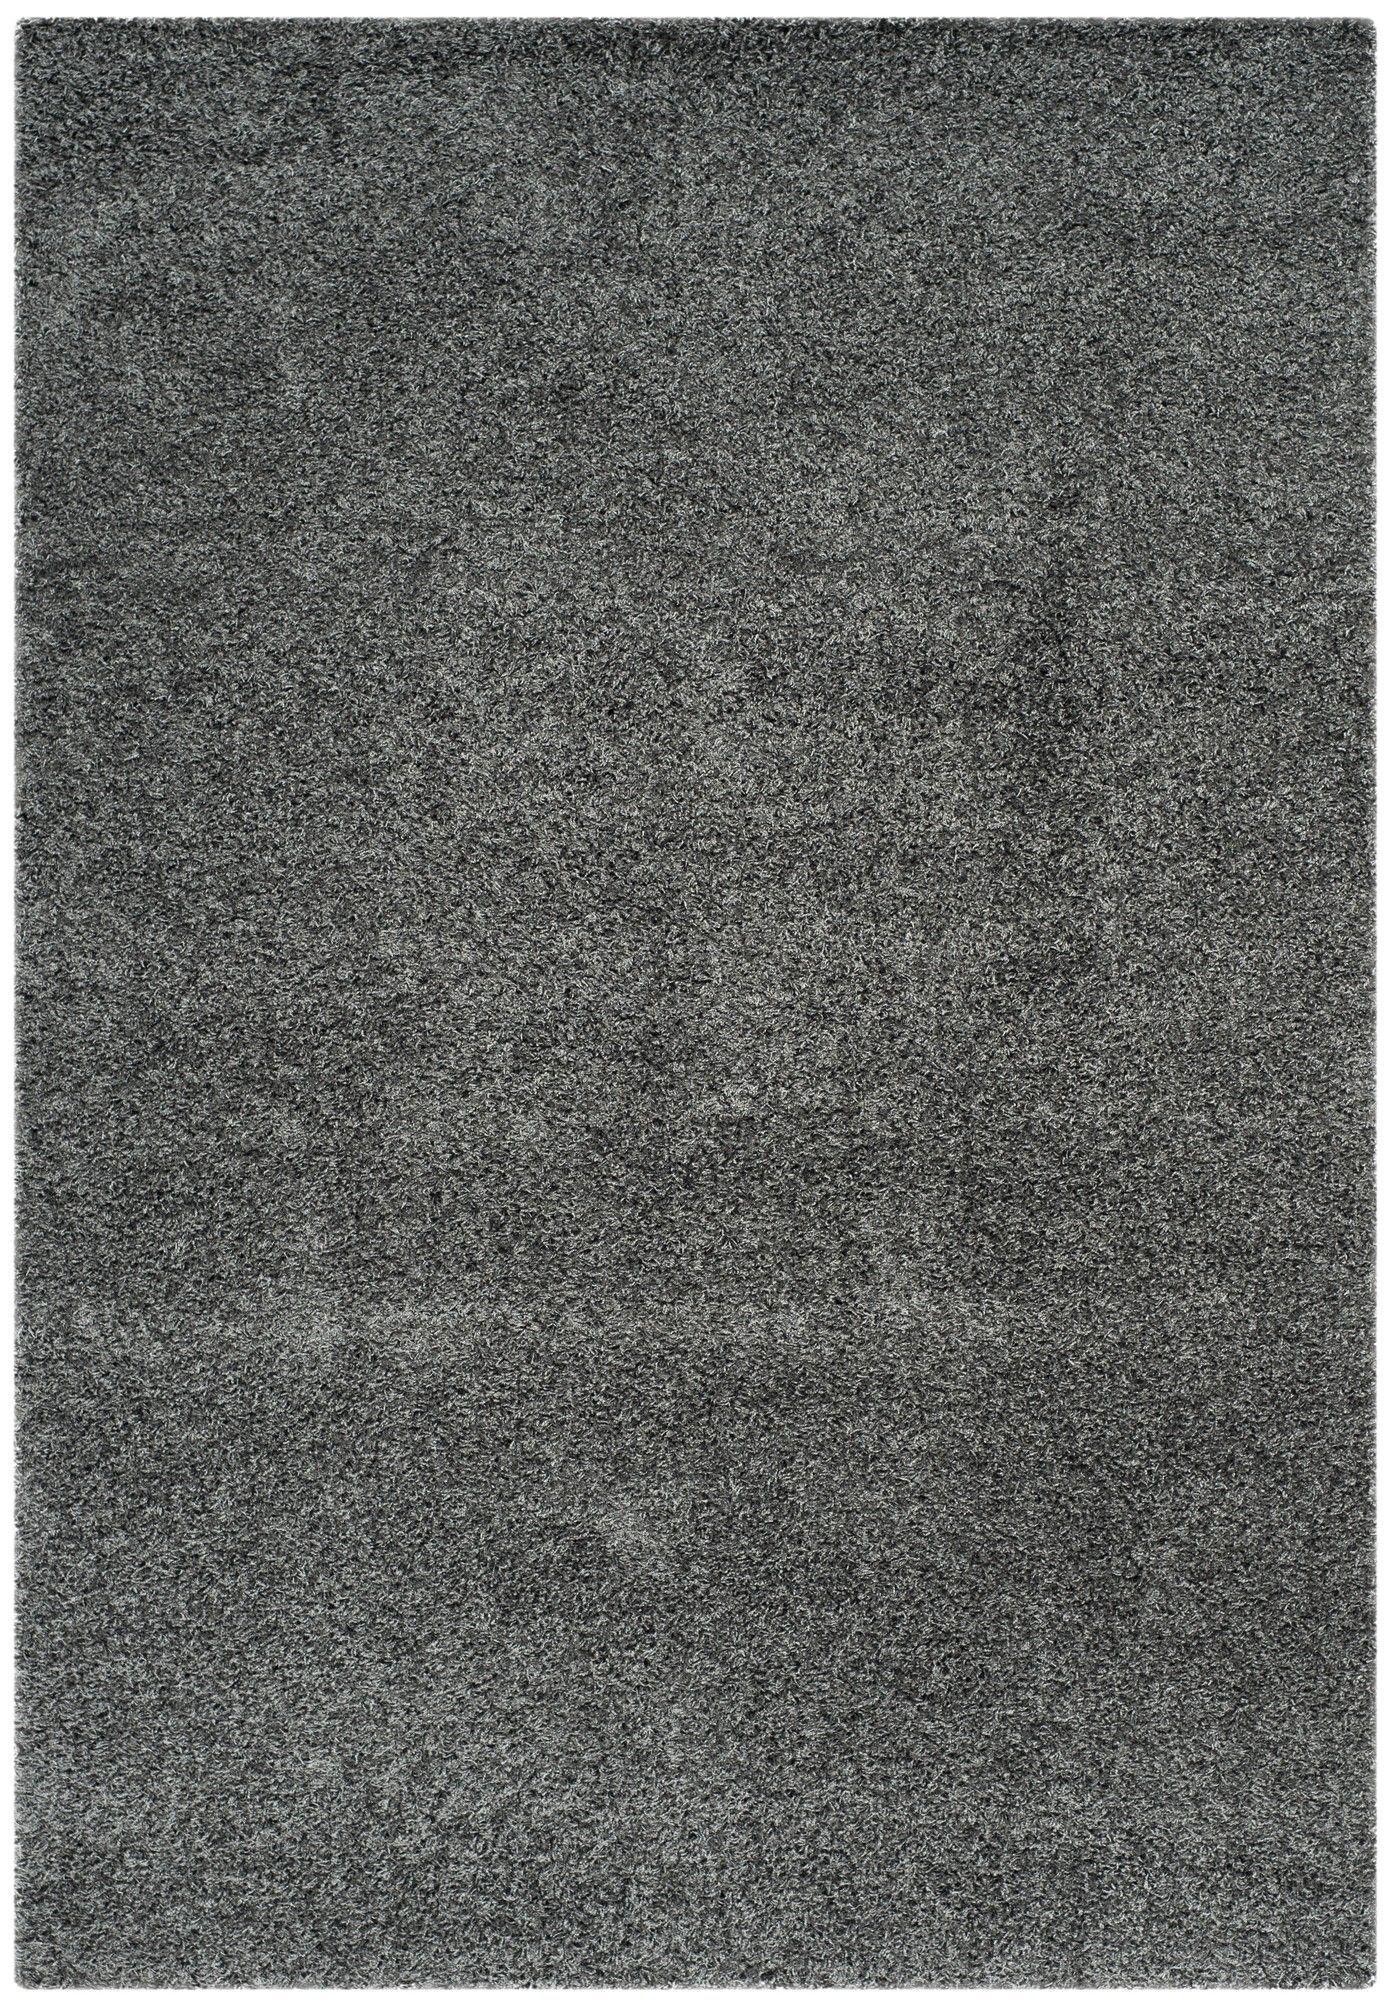 Nickols Shag Gray Area Rug In 2019